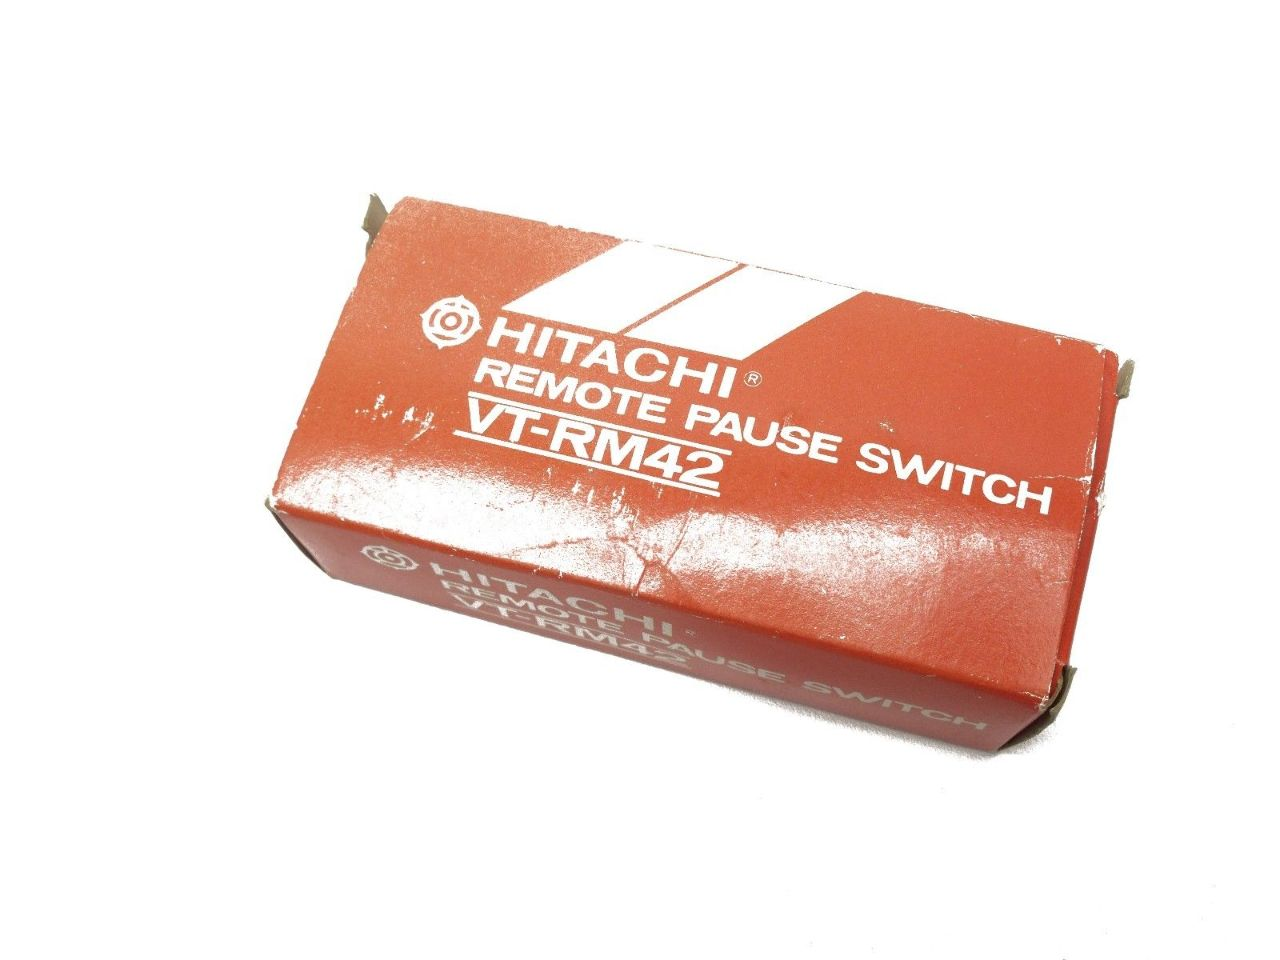 New Hitachi VT-RM42 Remote Pause Switch